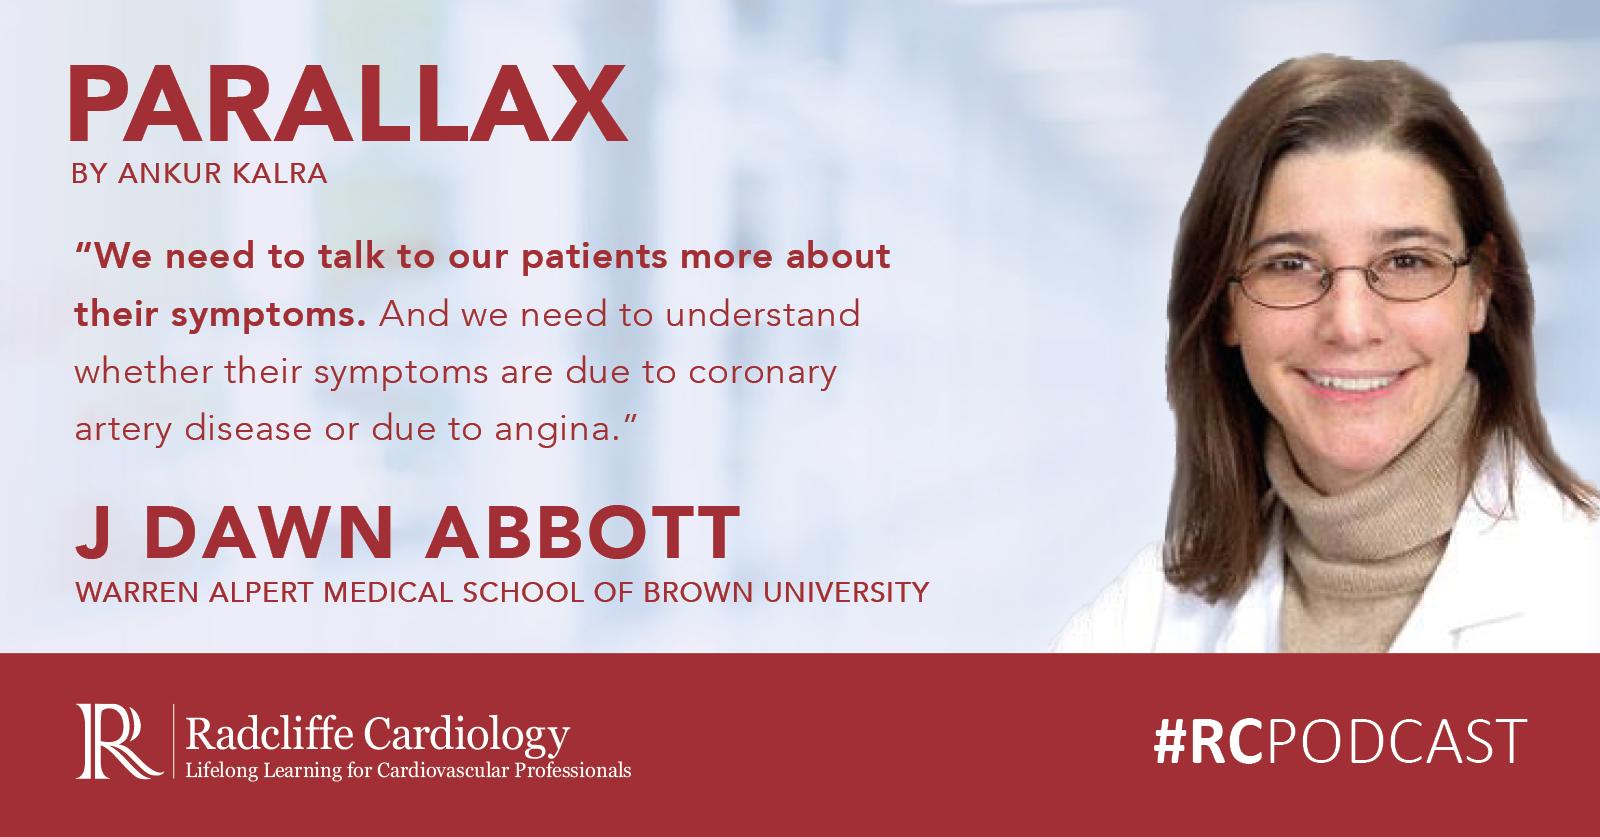 04: J Dawn Abbott On Recent Developments In Percutaneous Coronary Intervention